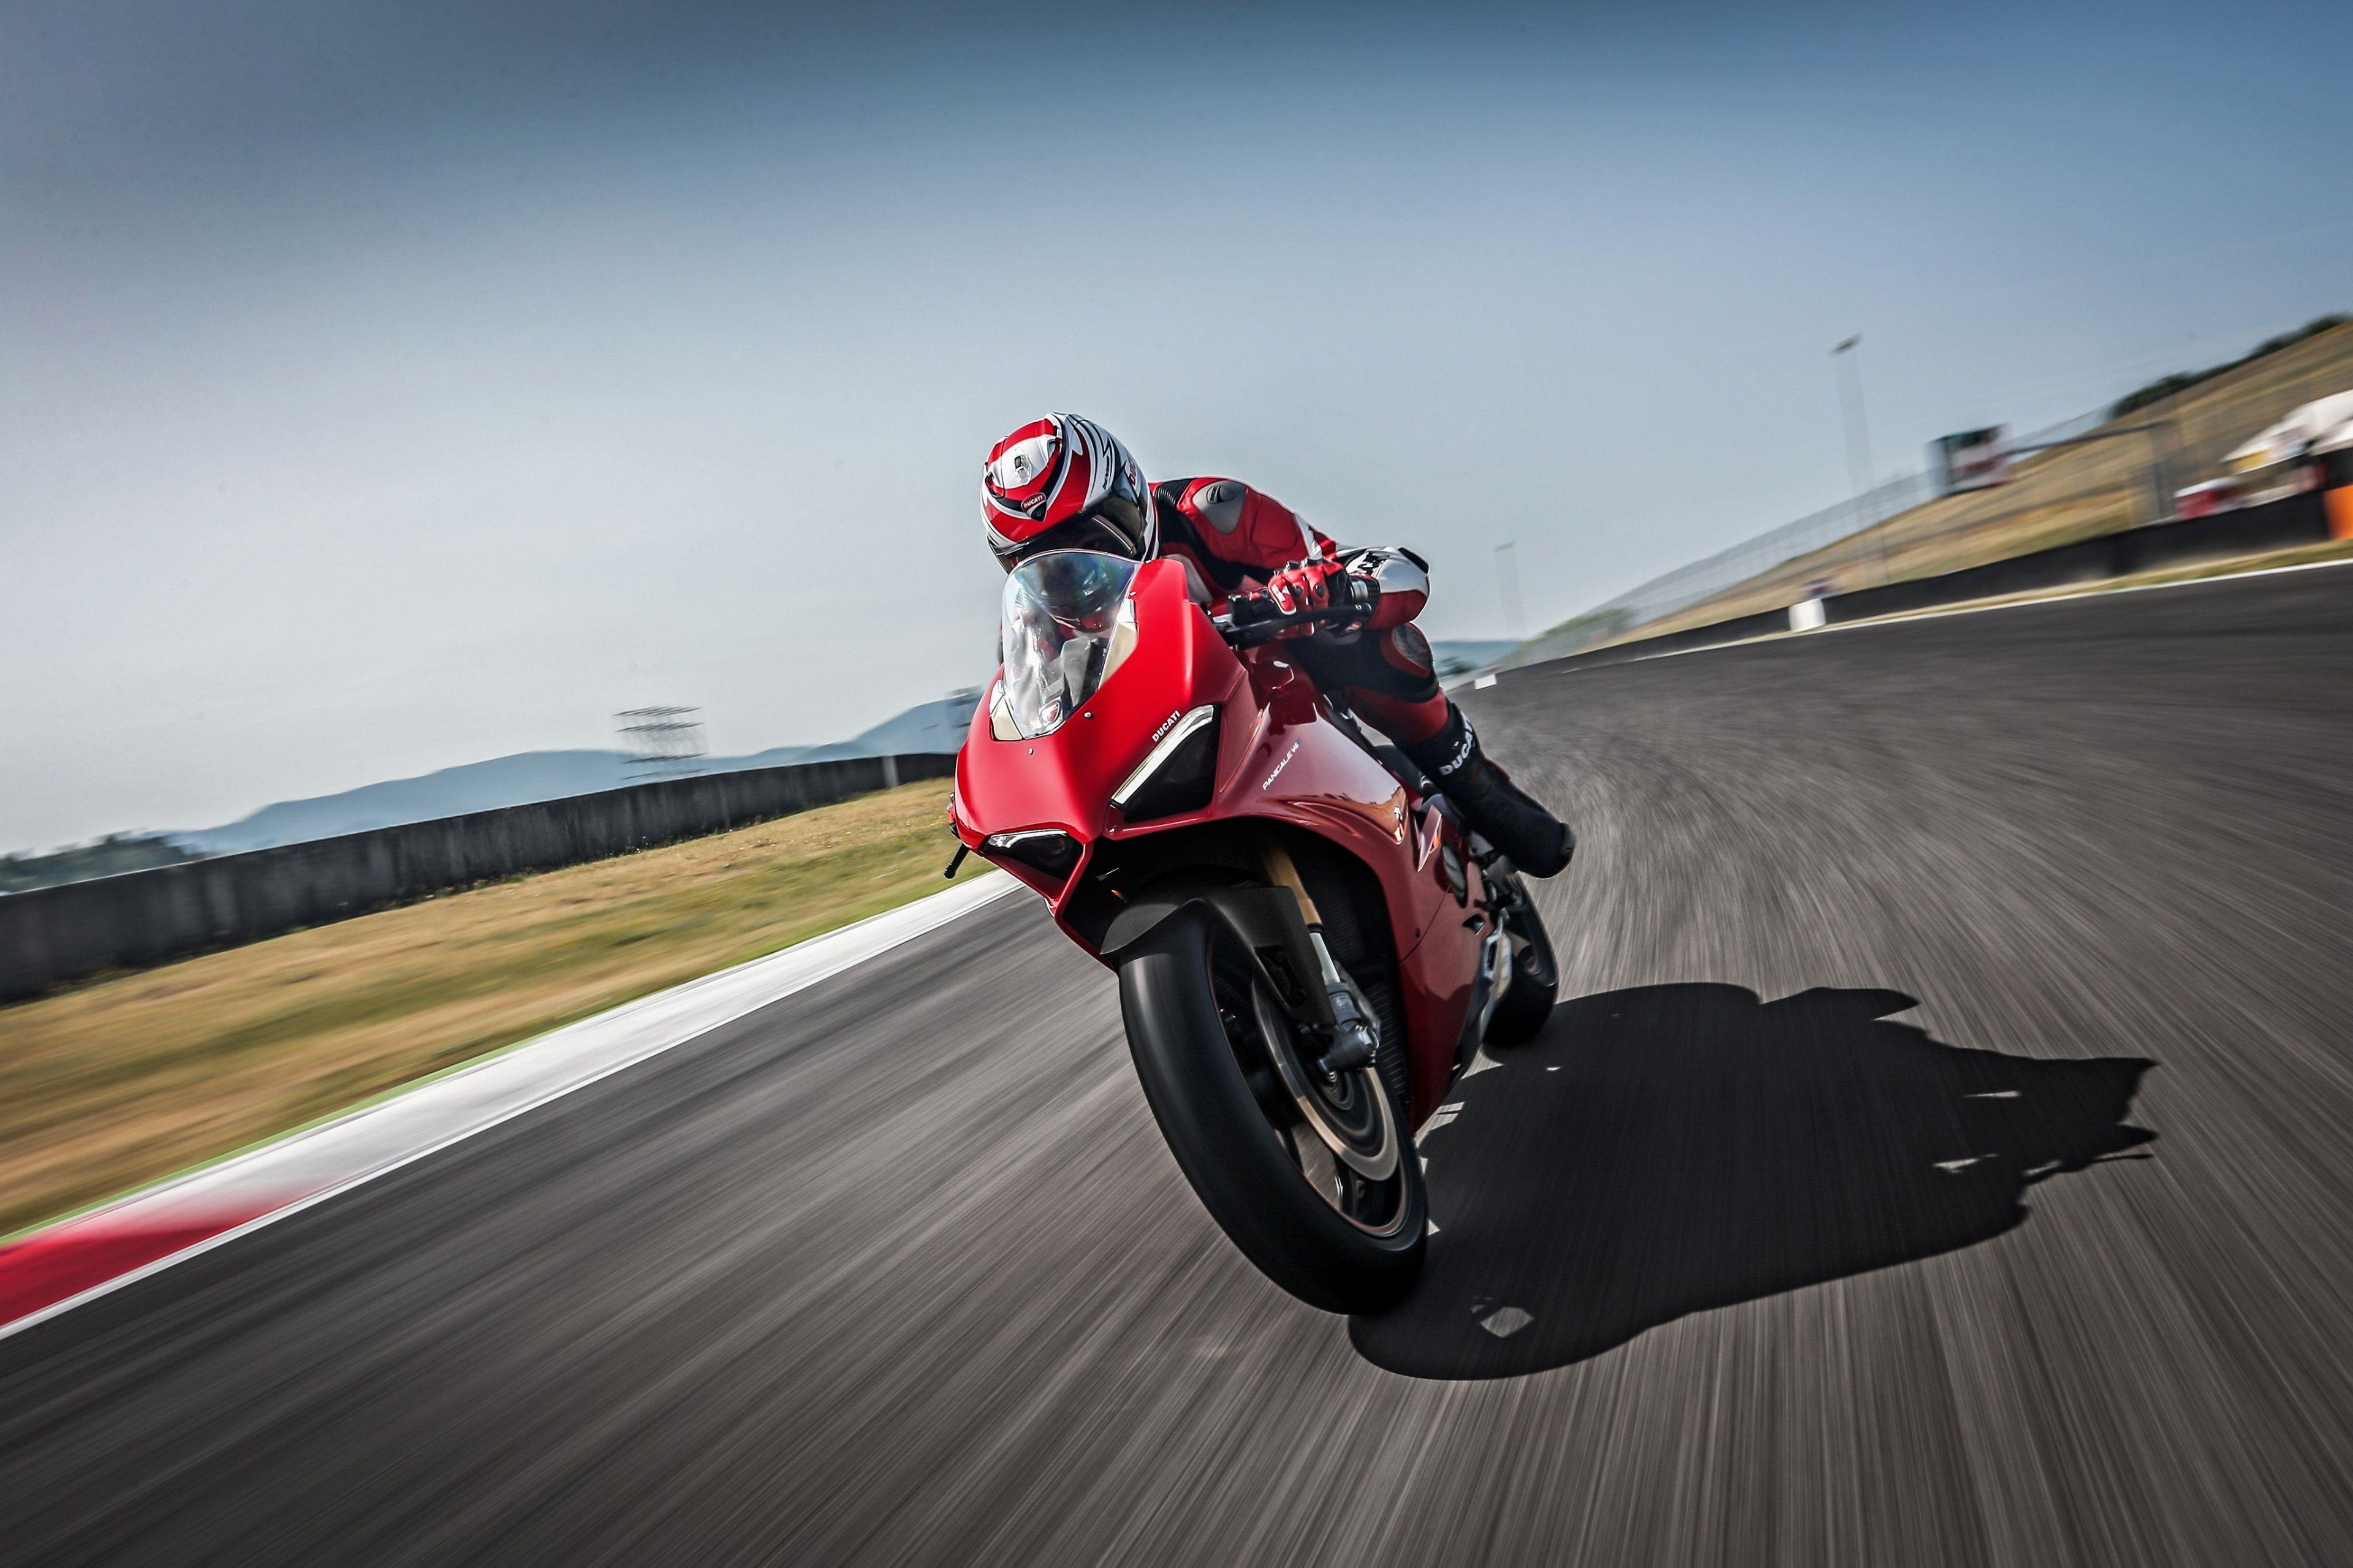 3840x2559 Ducati 4k Cool Hd Wallpaper Ducati Panigale Ducati